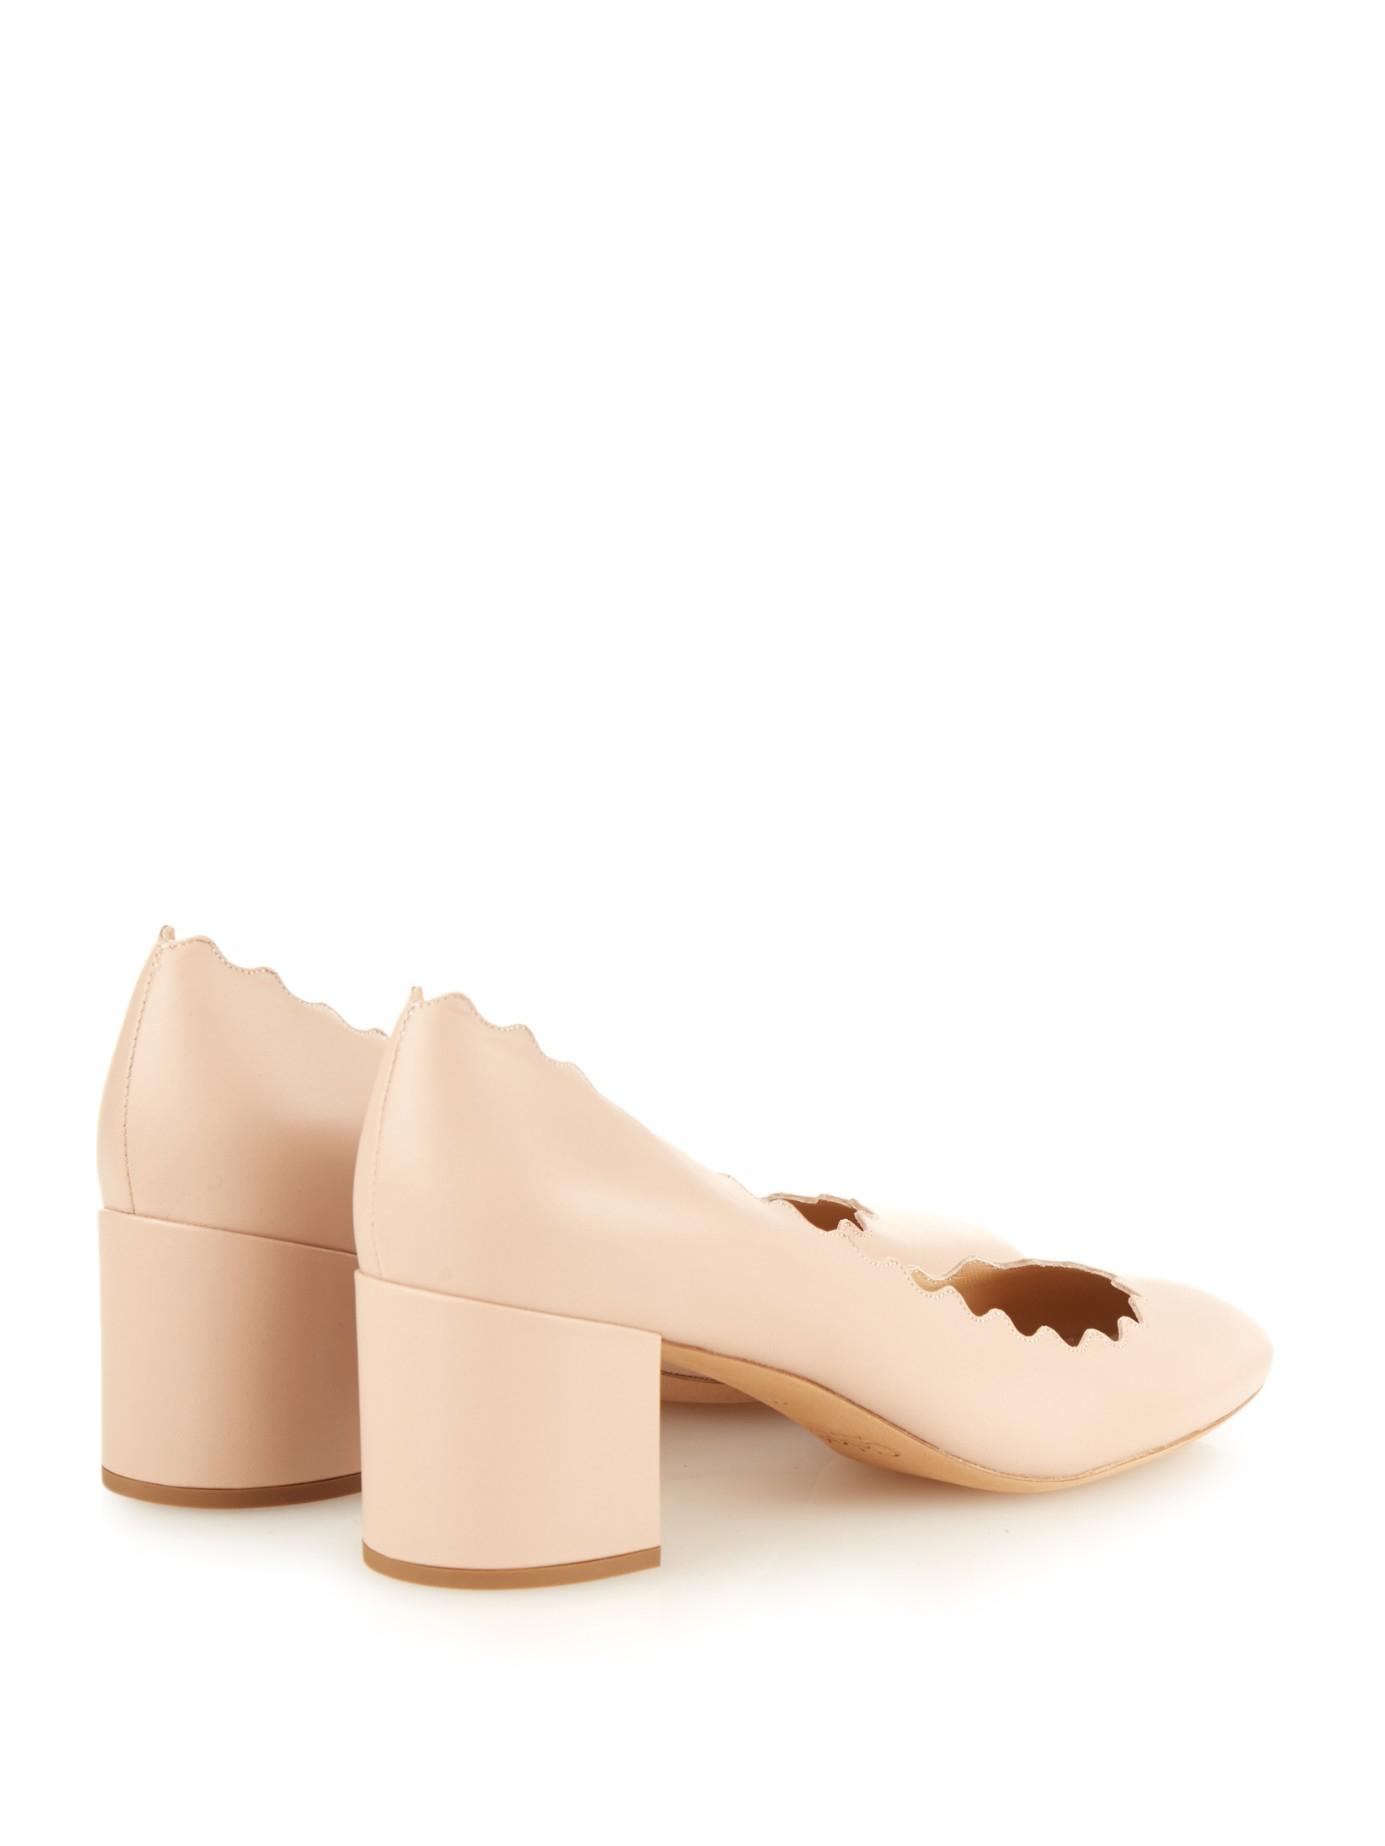 dccfe8ab1d4 Lyst - Chloé Lauren Scalloped-edge Block-heel Leather Pumps in Pink